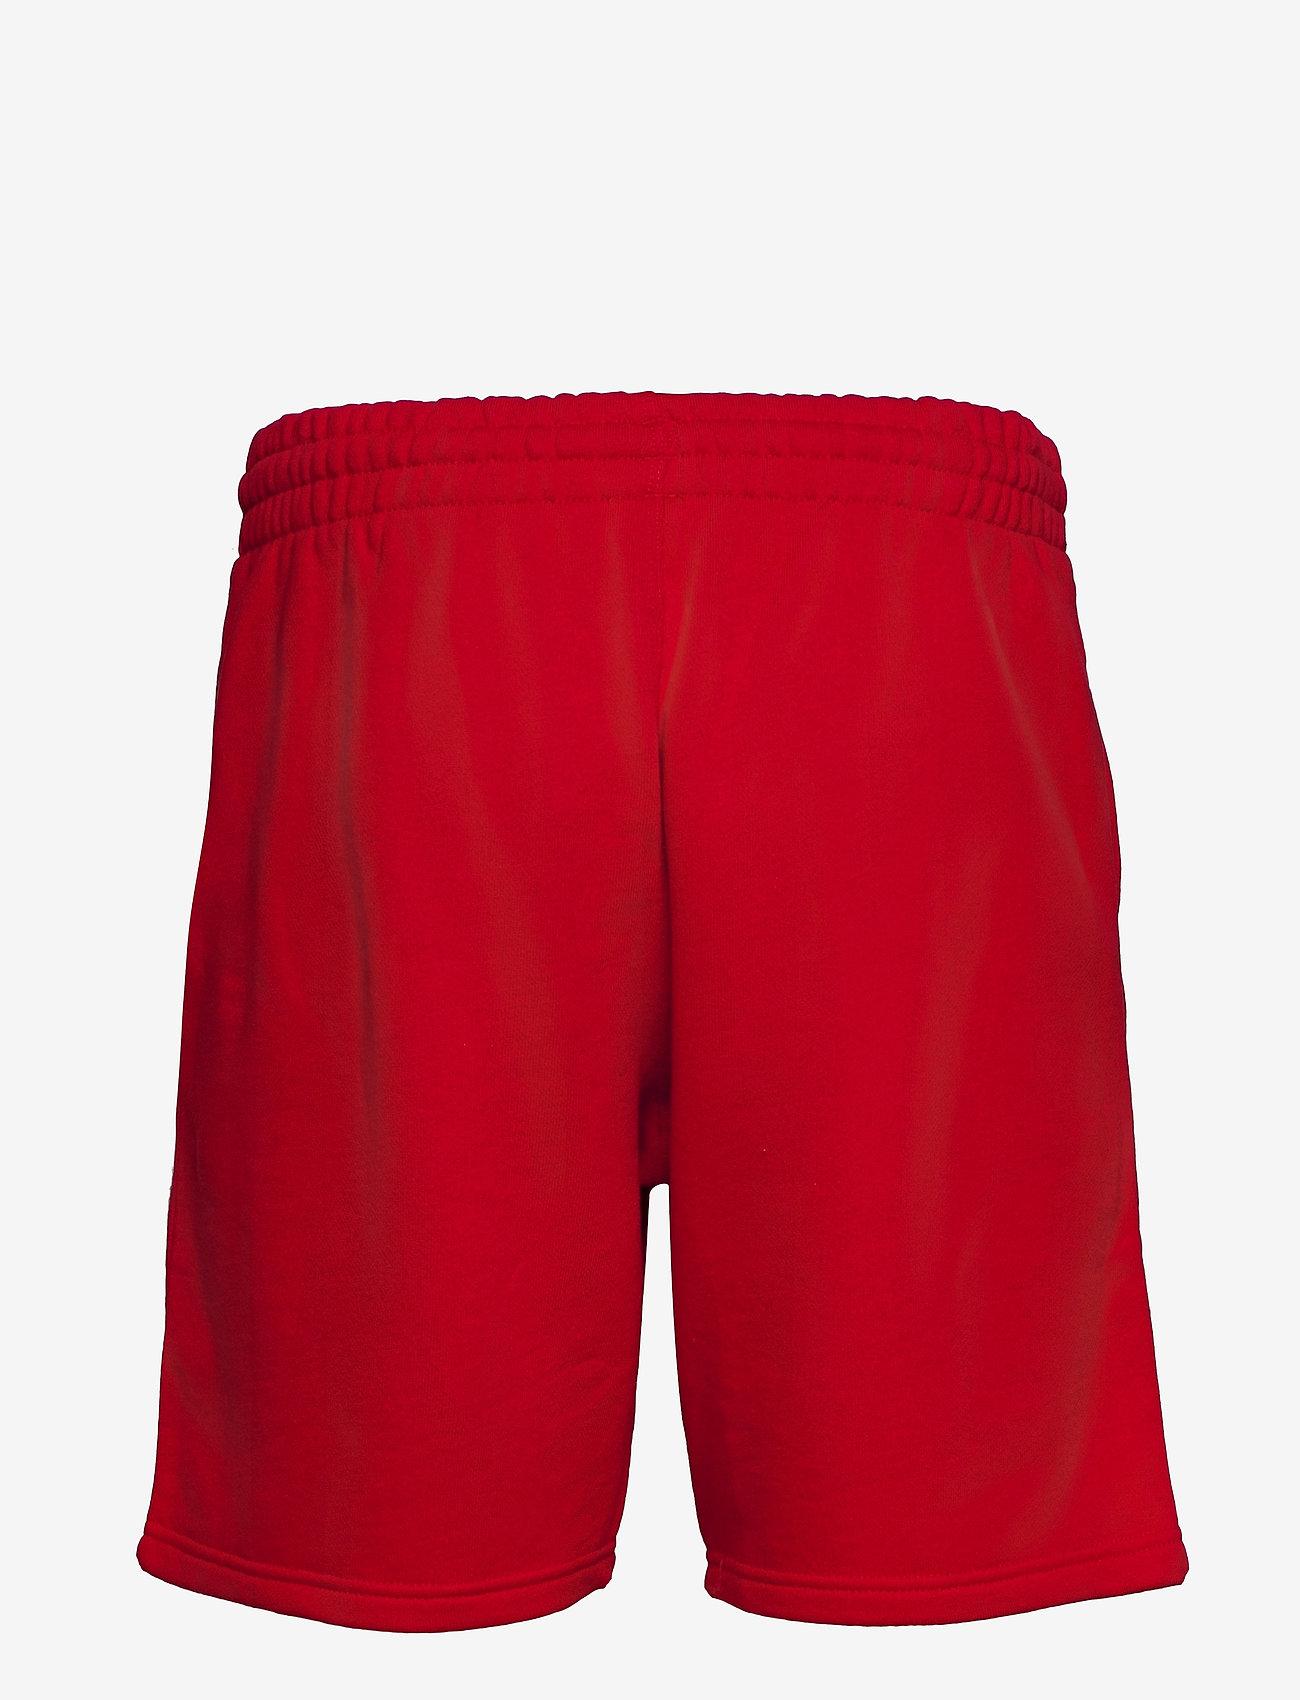 adidas Originals ESSENTIAL SHORT - Shorts SCARLE - Menn Klær